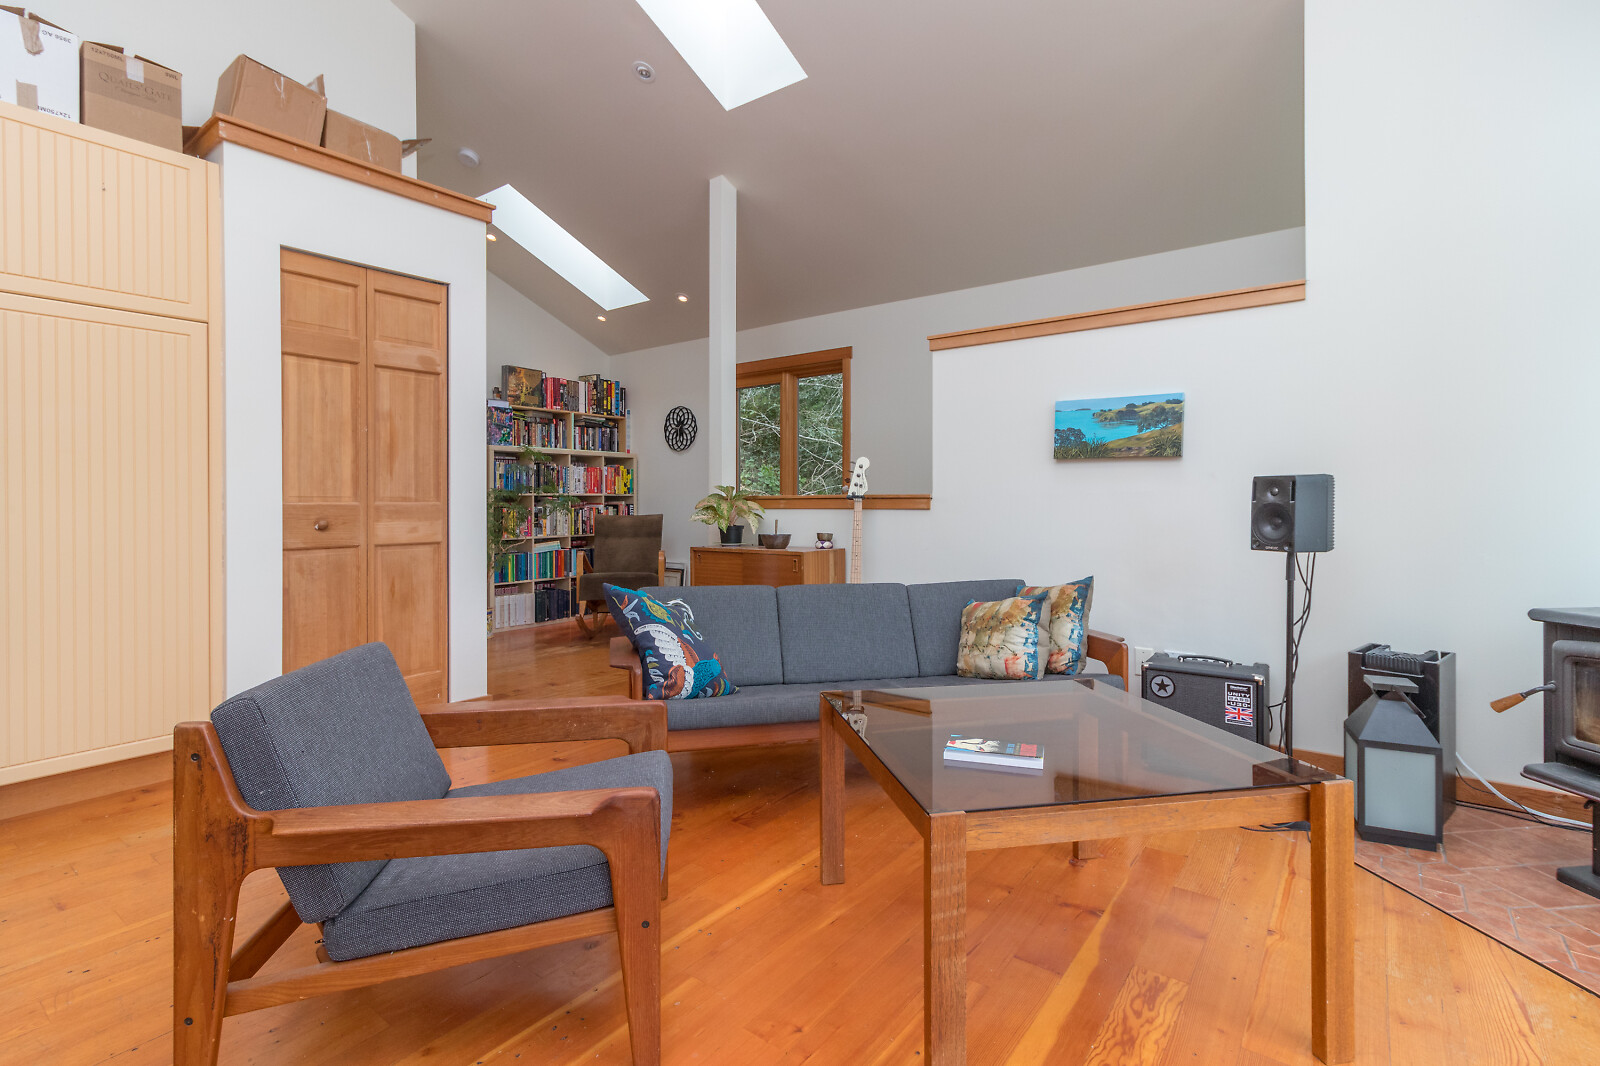 4362 Brentview Dr, Cowichan Bay, British Columbia  V0R 1N2 - Photo 7 - 868691